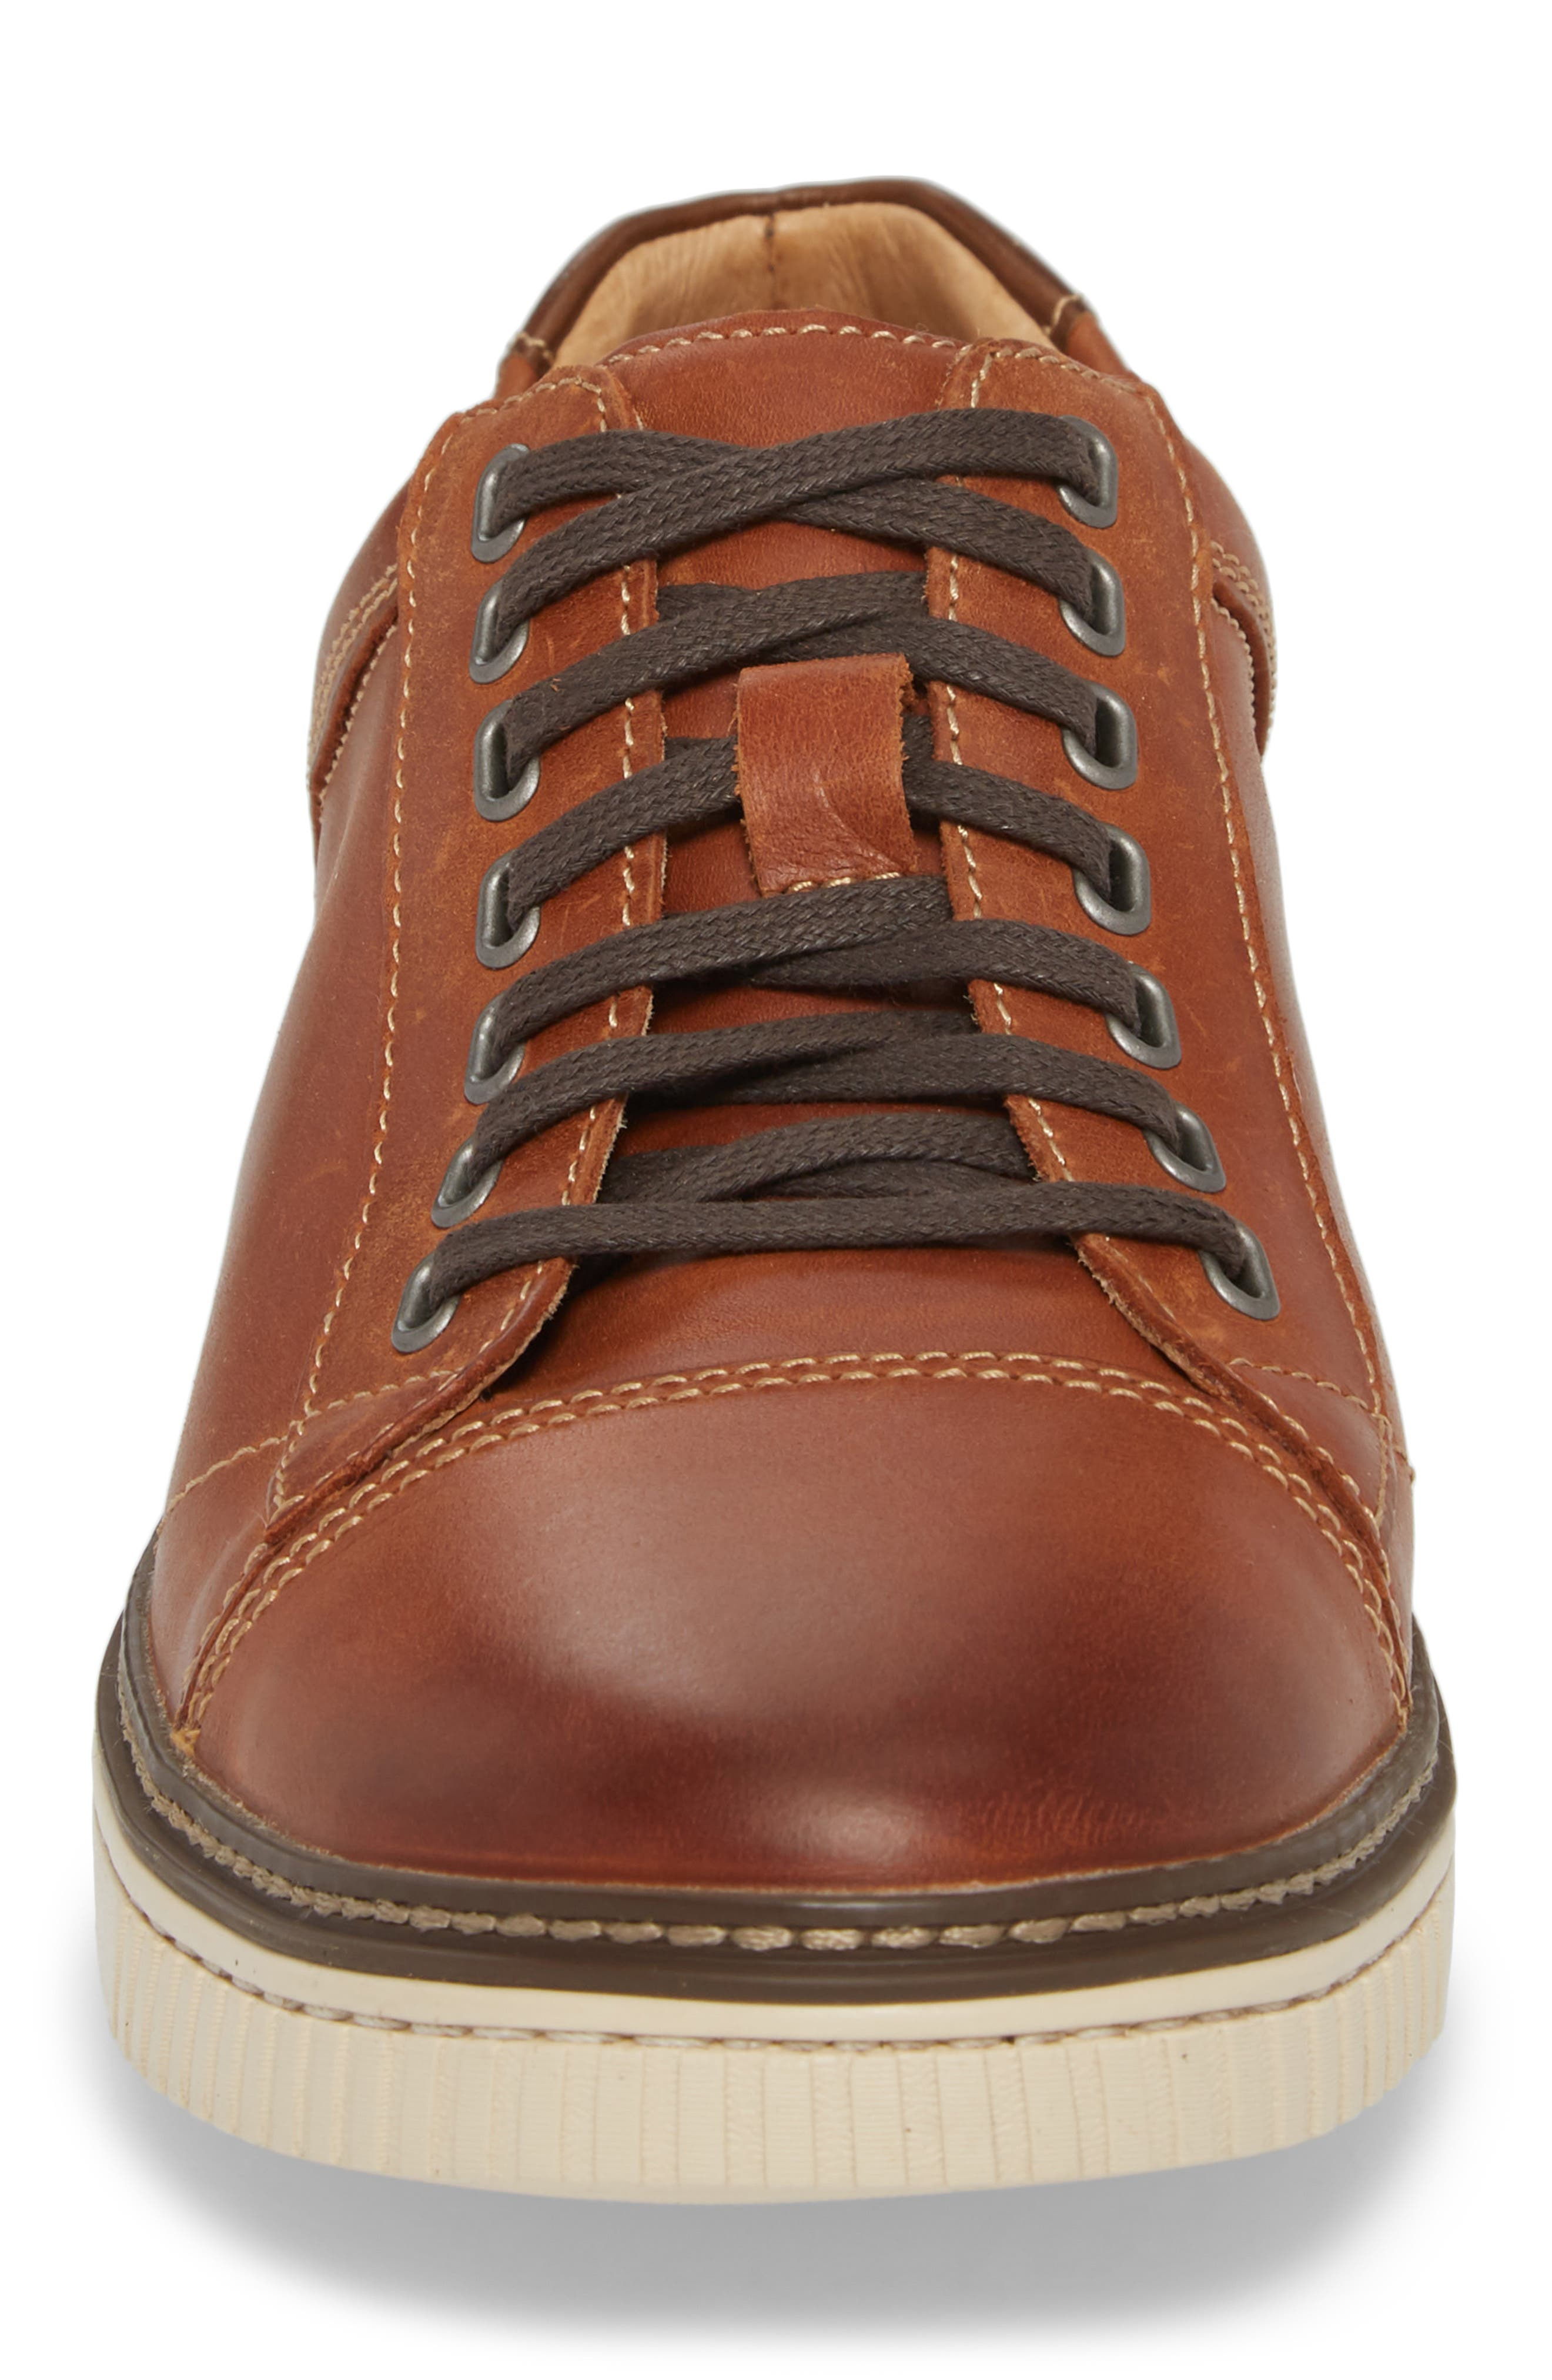 Wallace Low Top Sneaker,                             Alternate thumbnail 4, color,                             Tan Nubuck